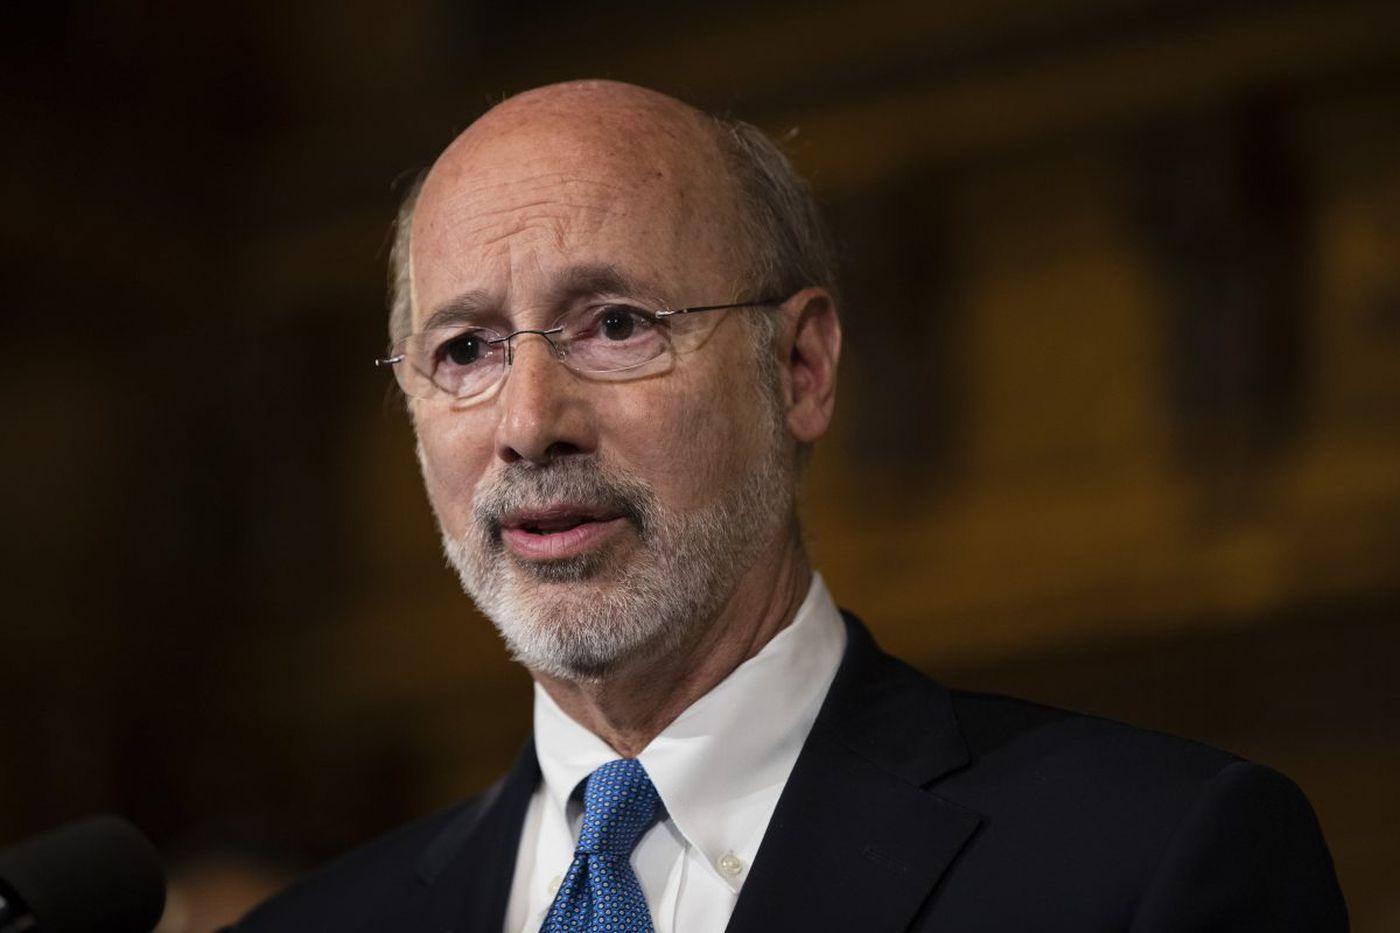 Pa. budget talks drag on